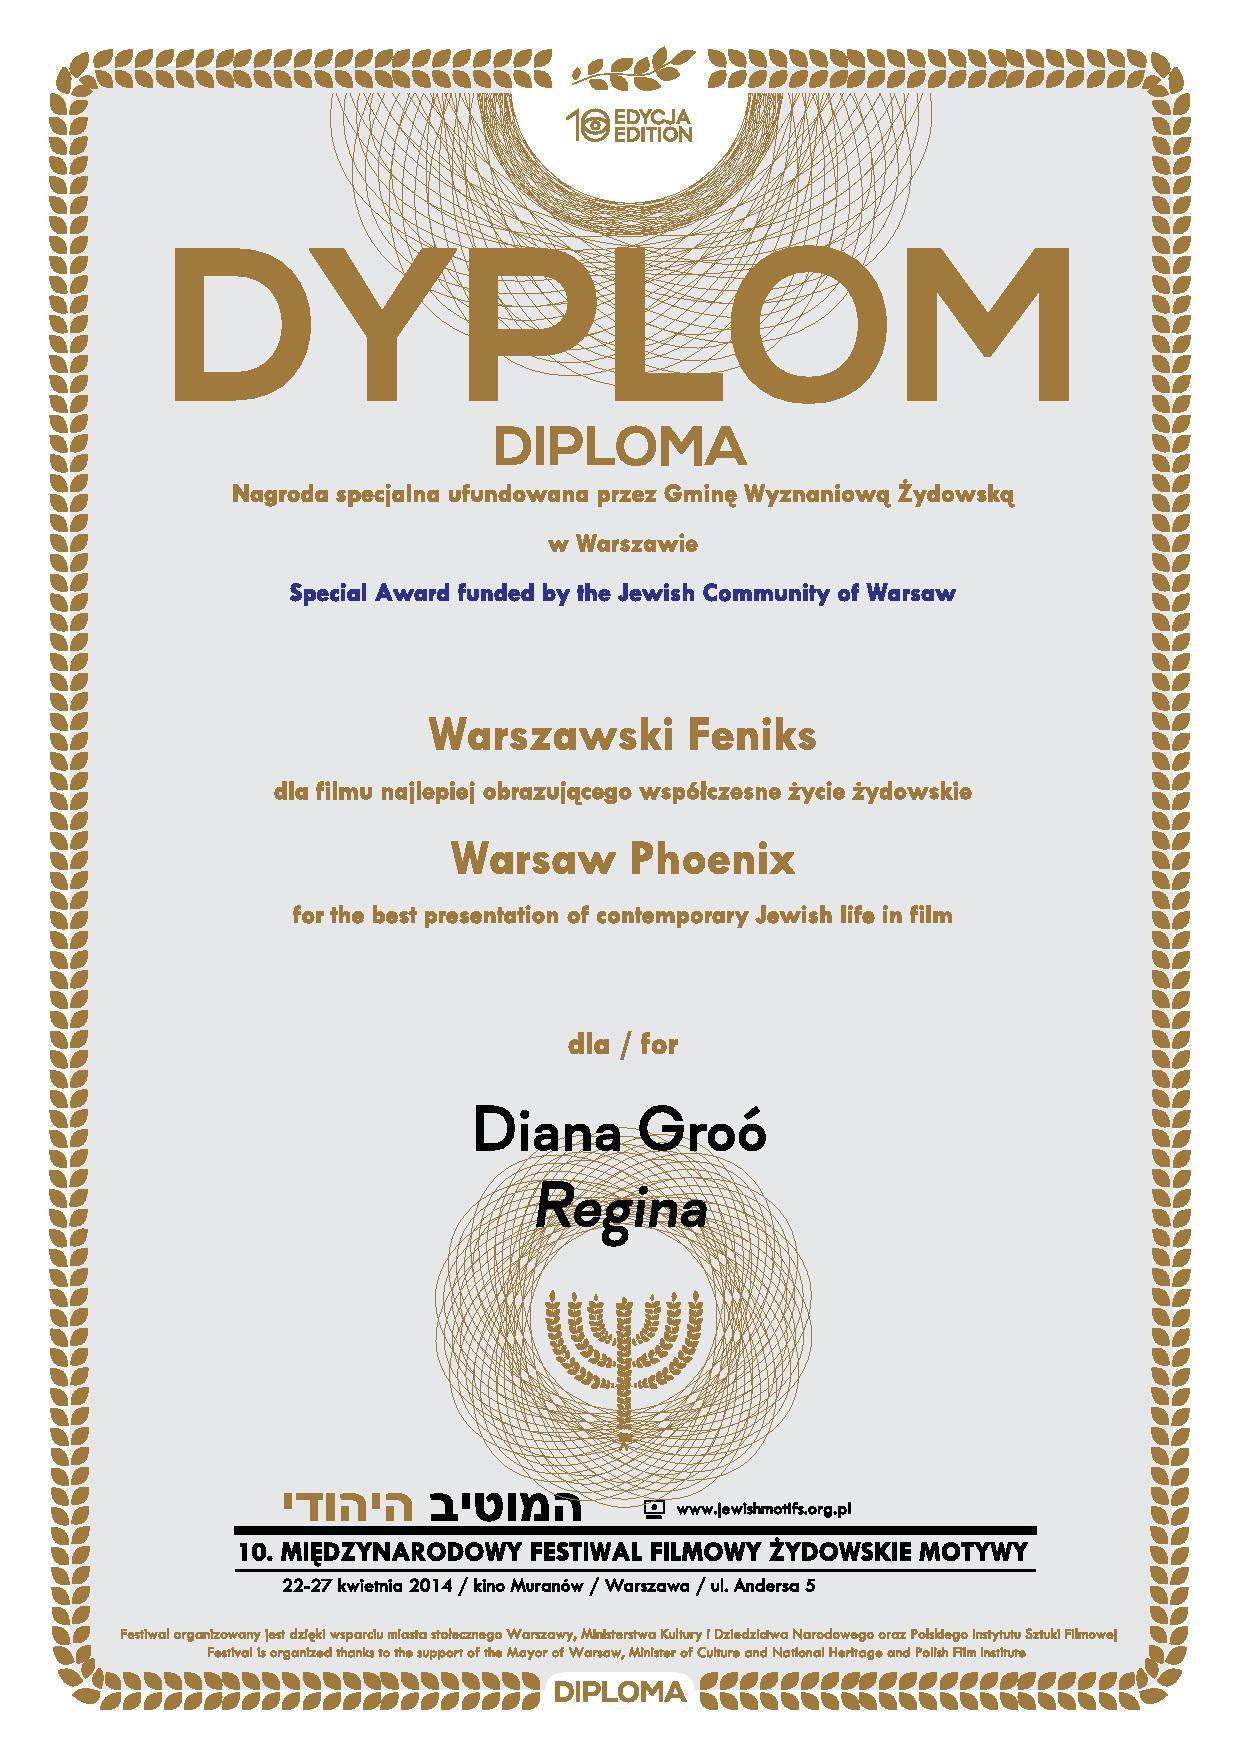 Warsaw Phoenix Award